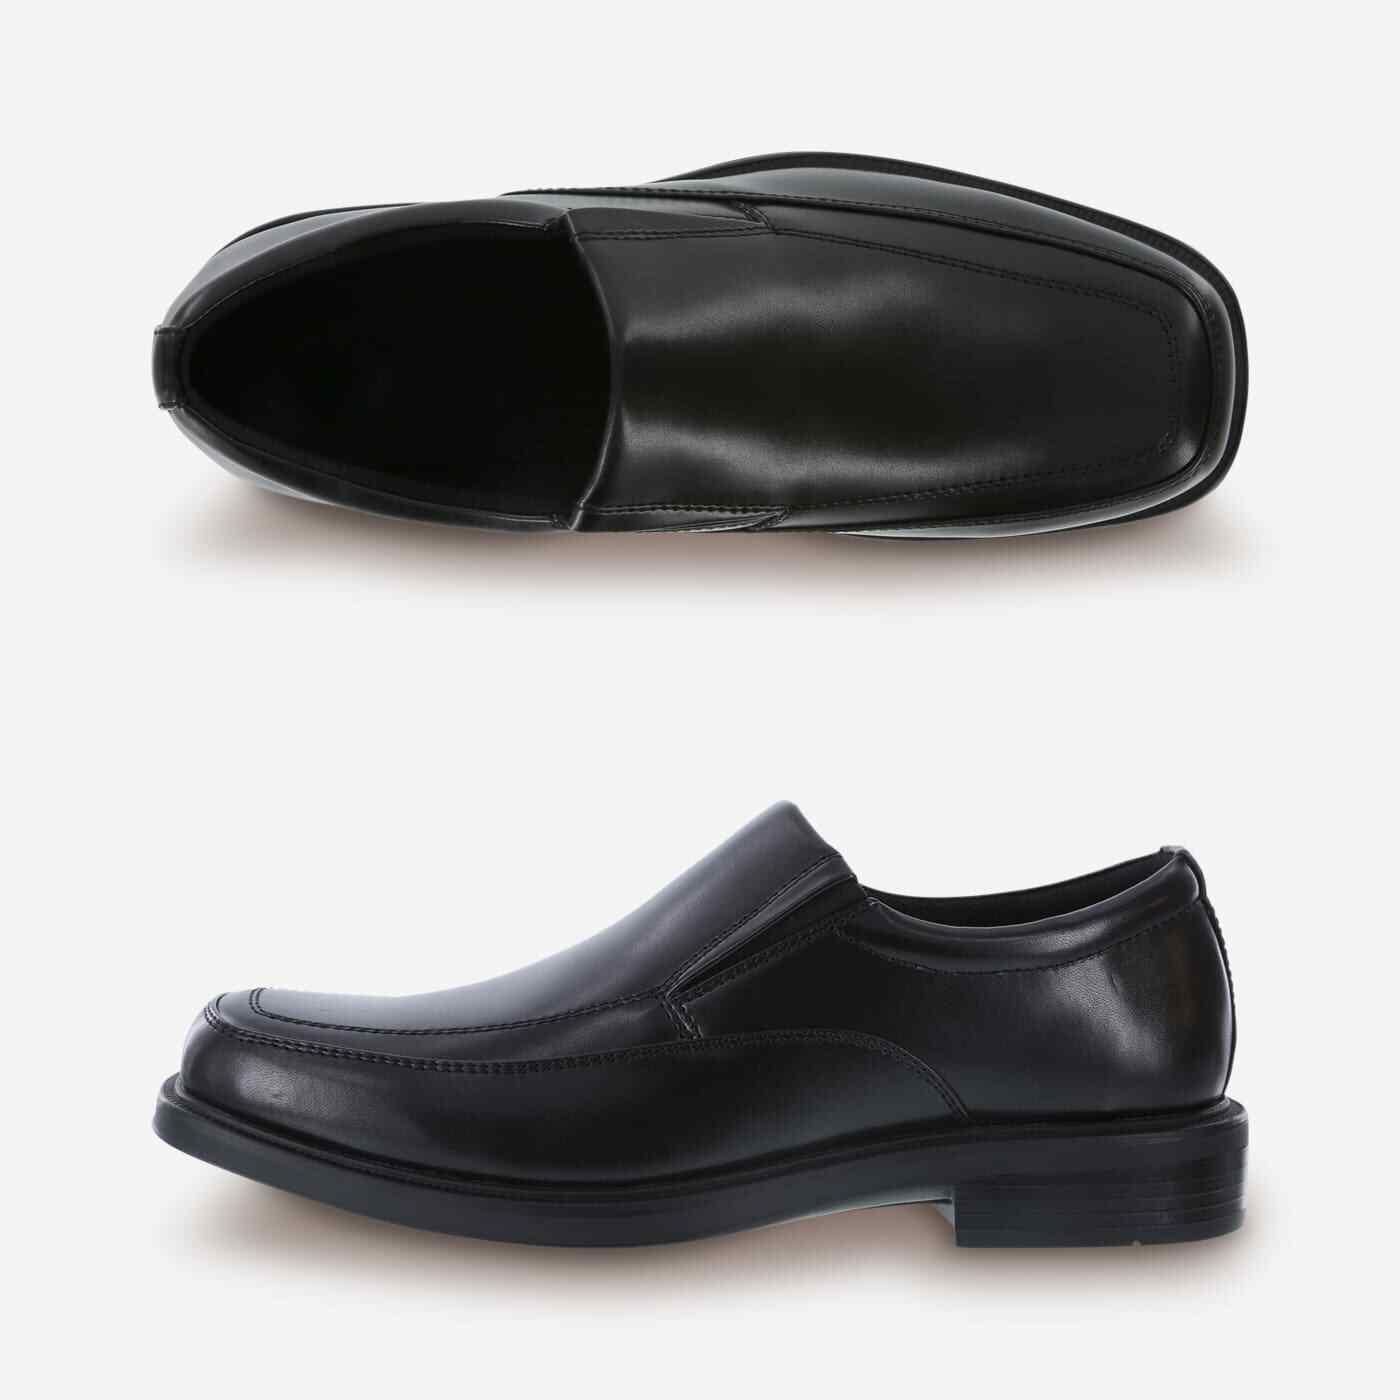 Dexter Comfort Men's Spencer Loafers Slip-On Black shoes Sz 8 Medium Width